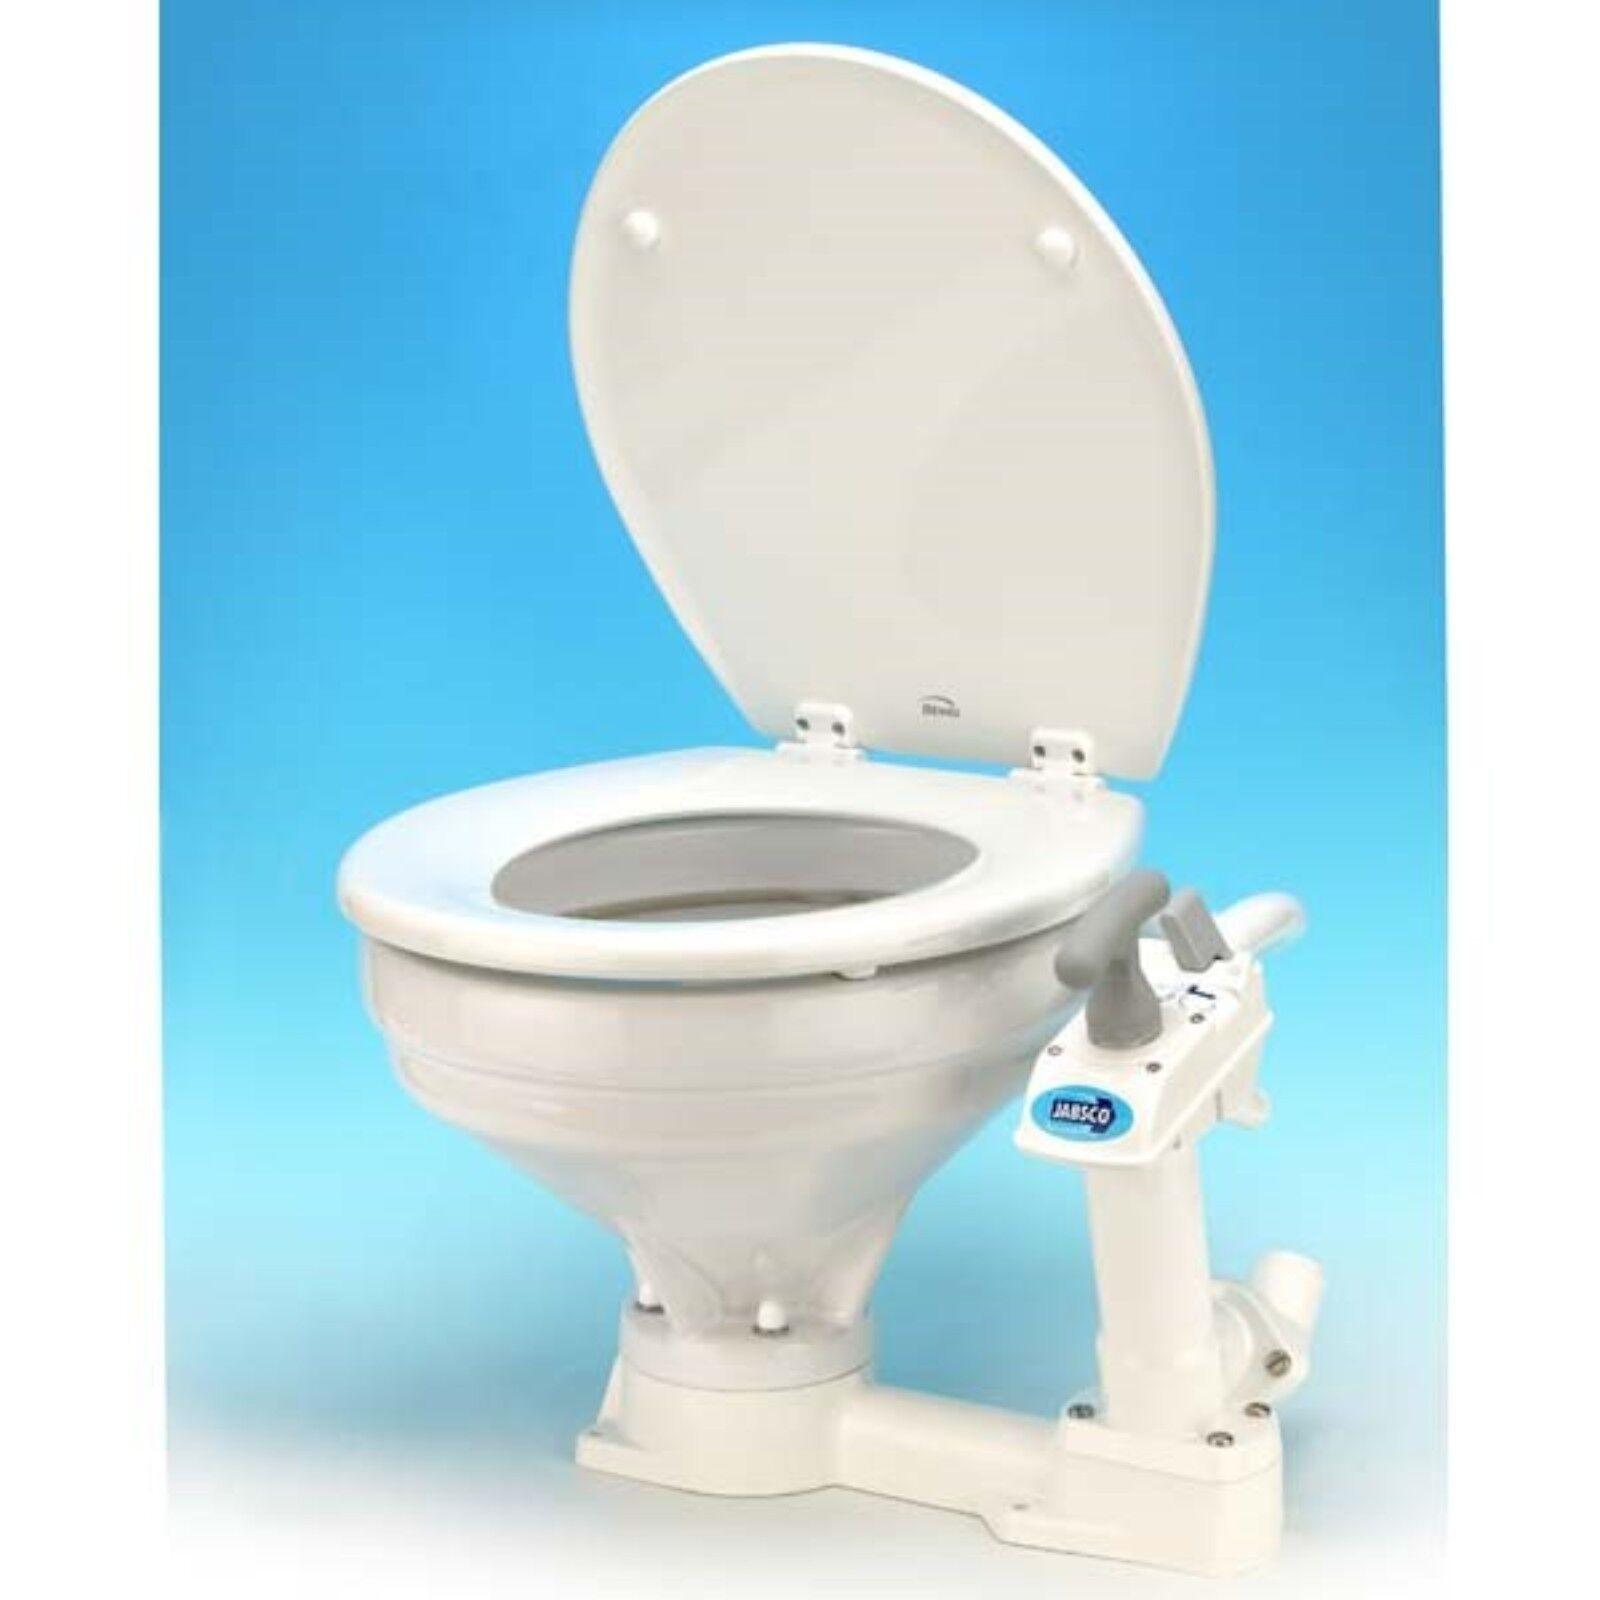 ITT Jabsco 29120-3000 Manual Standard Marine Toilet Circular ...